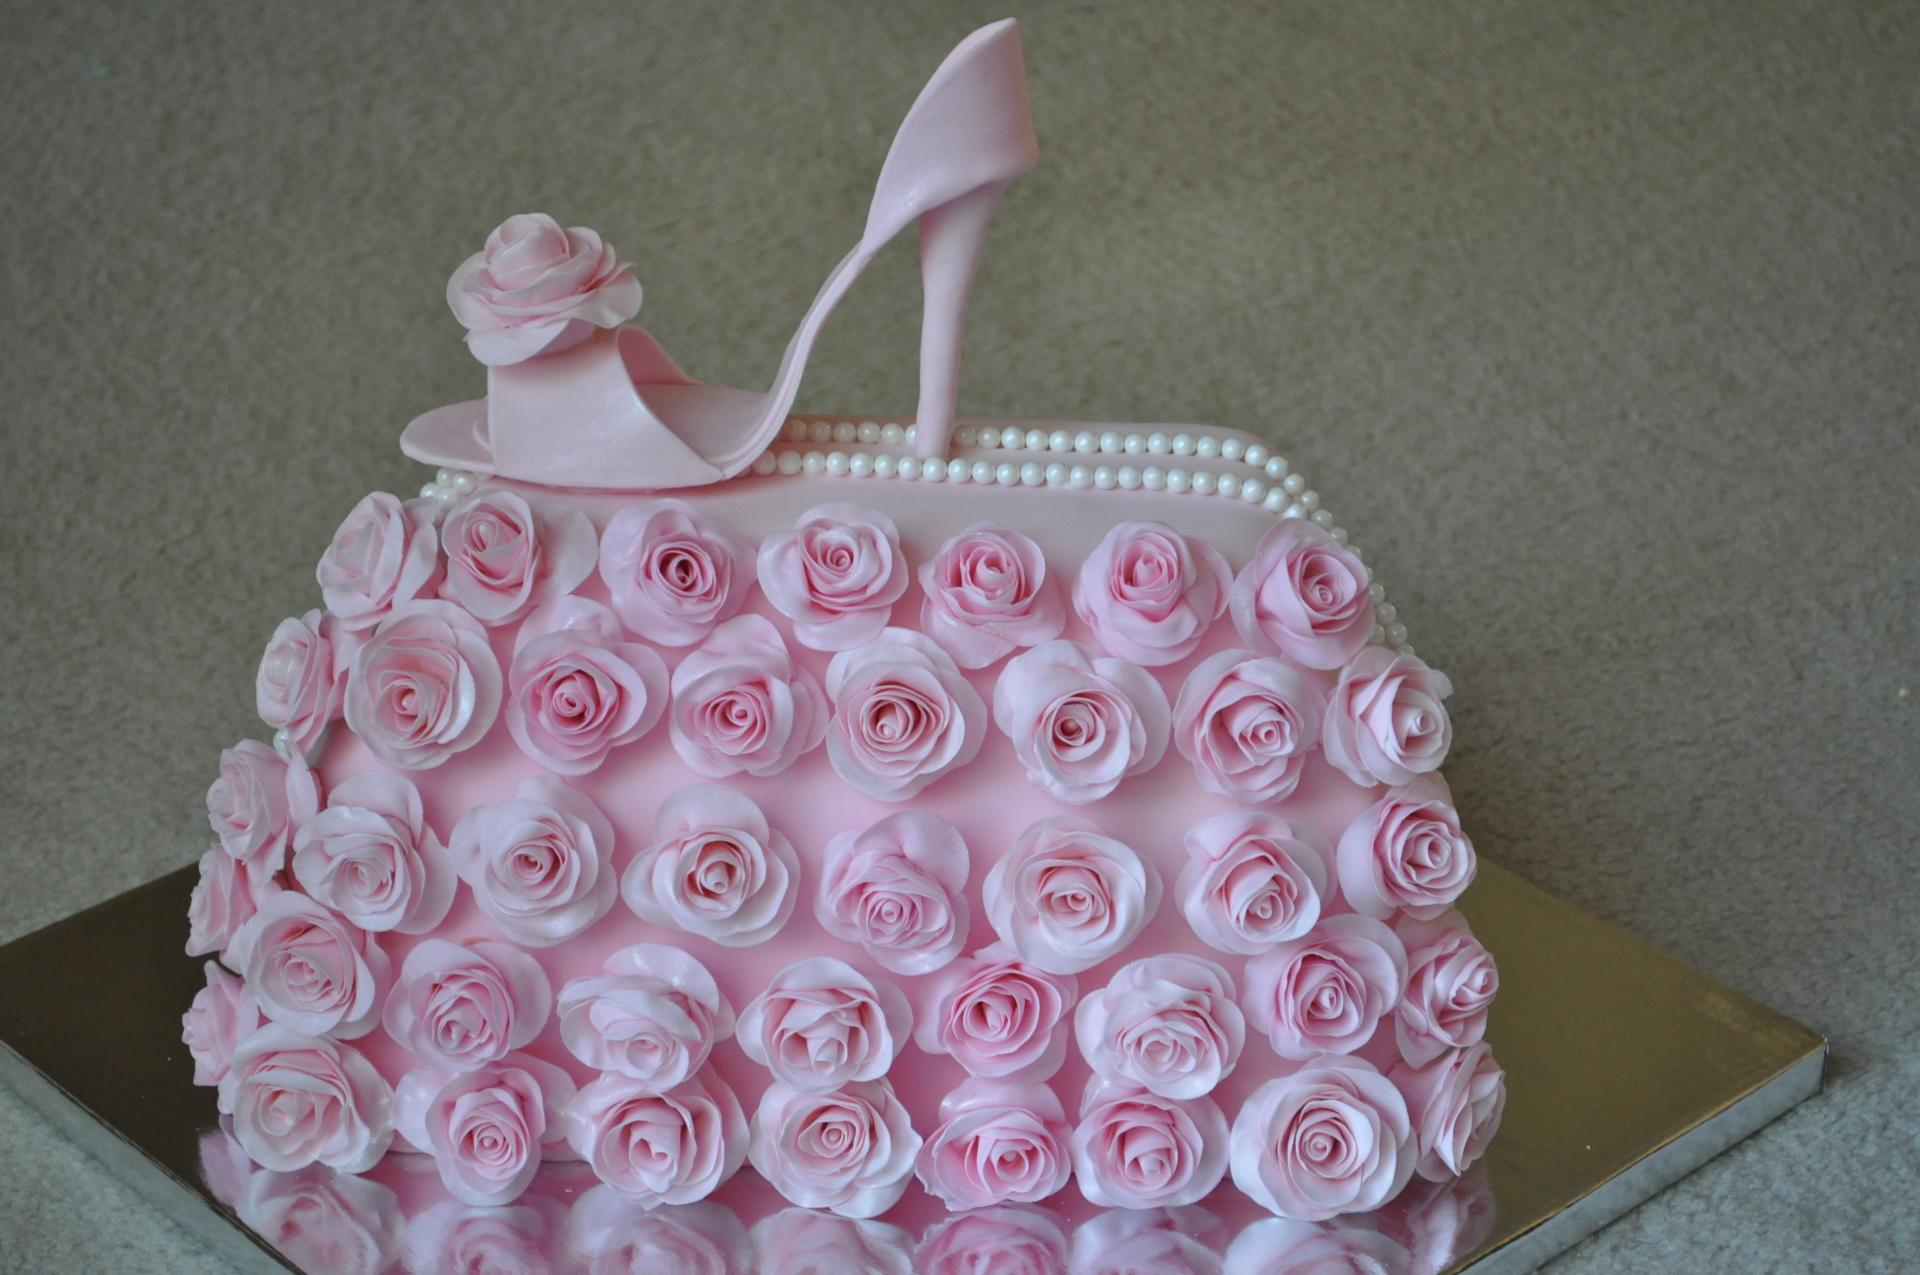 Pink rose handbag and heel